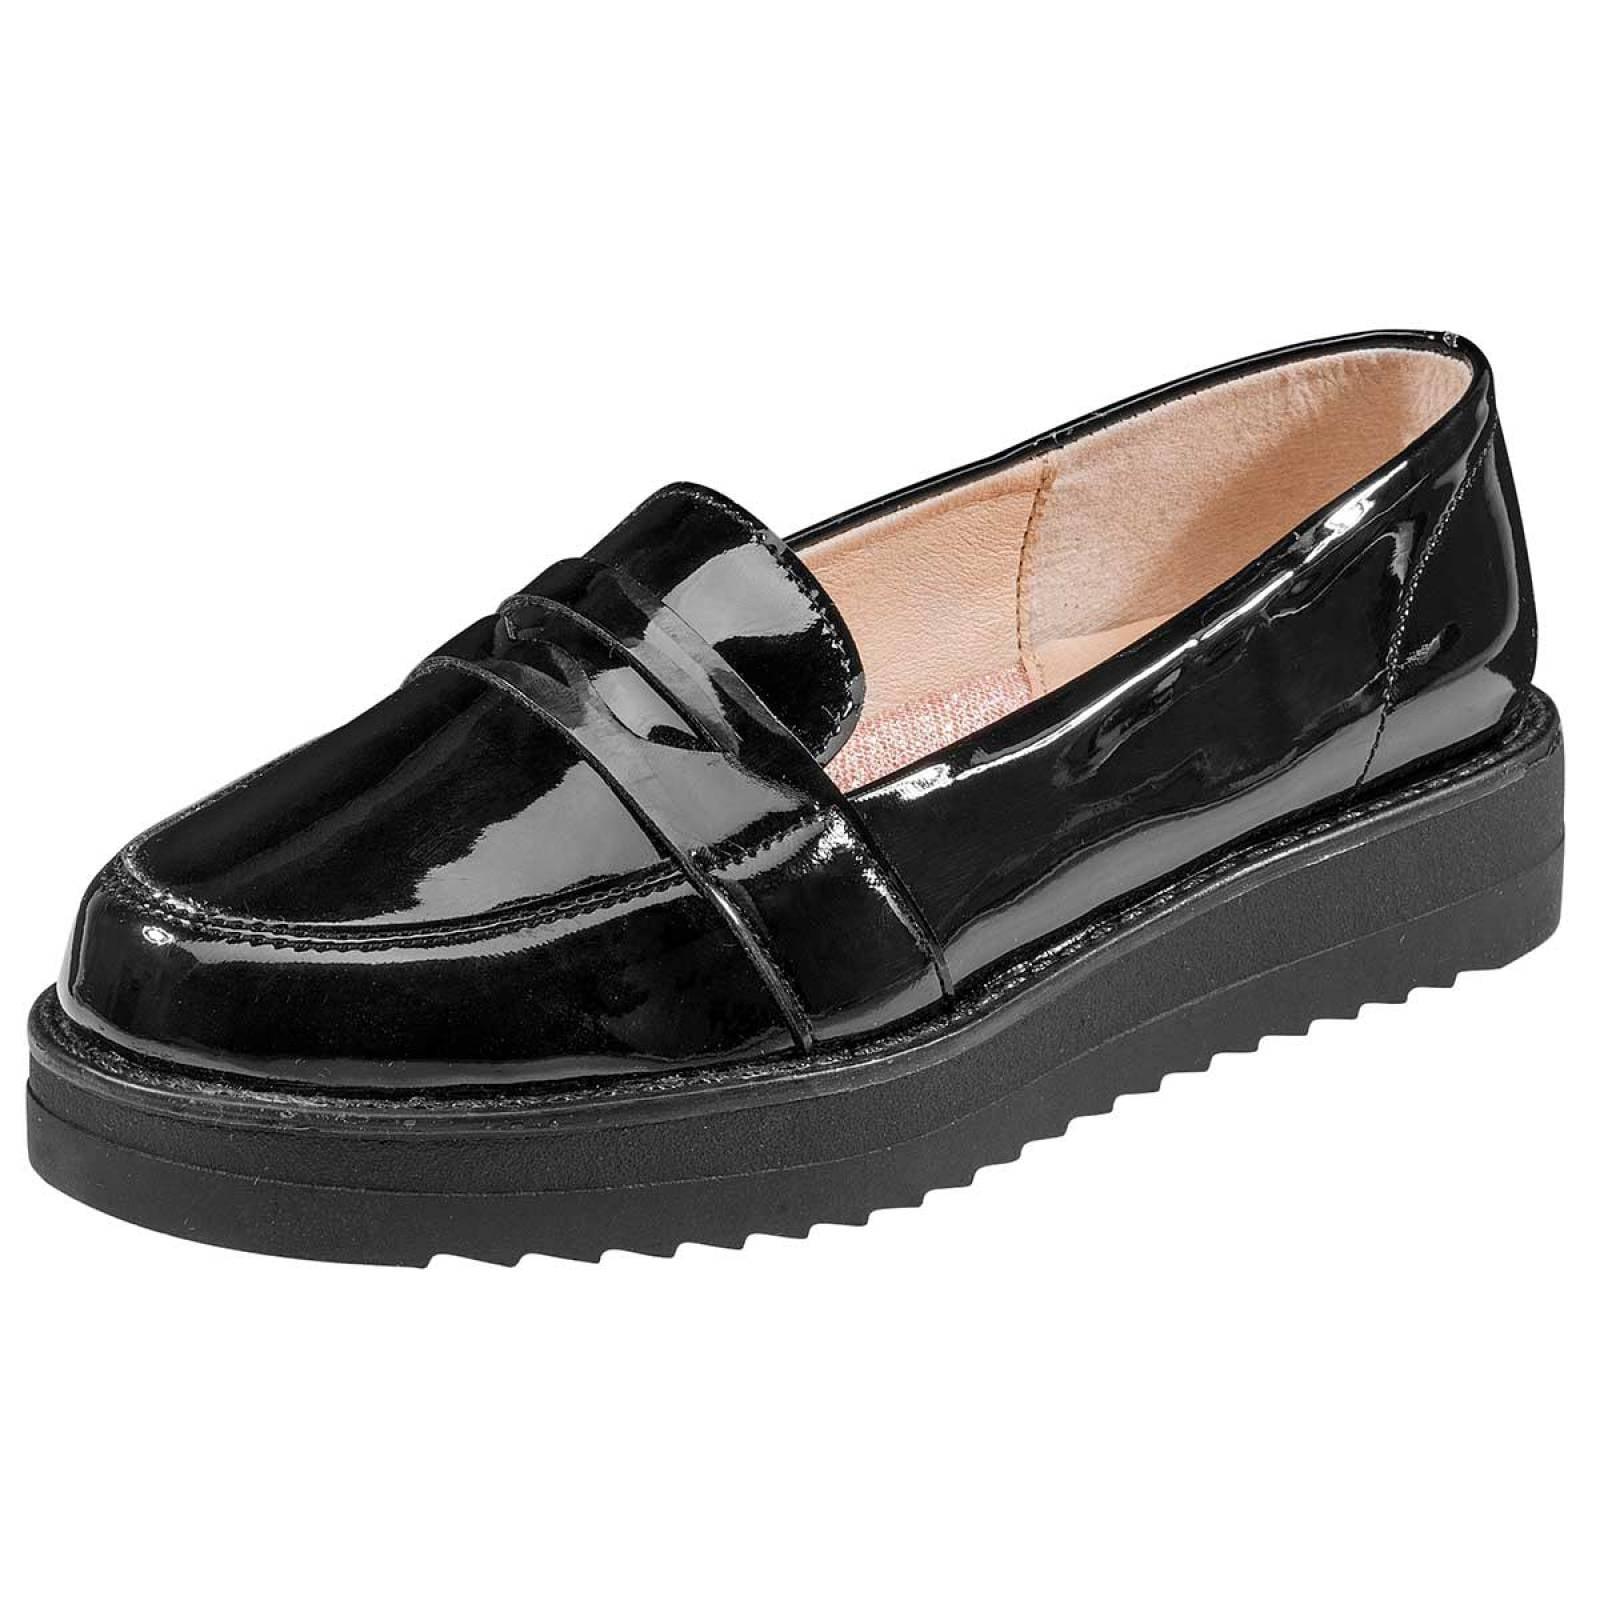 Tropicana Zapato Niña Negro charol